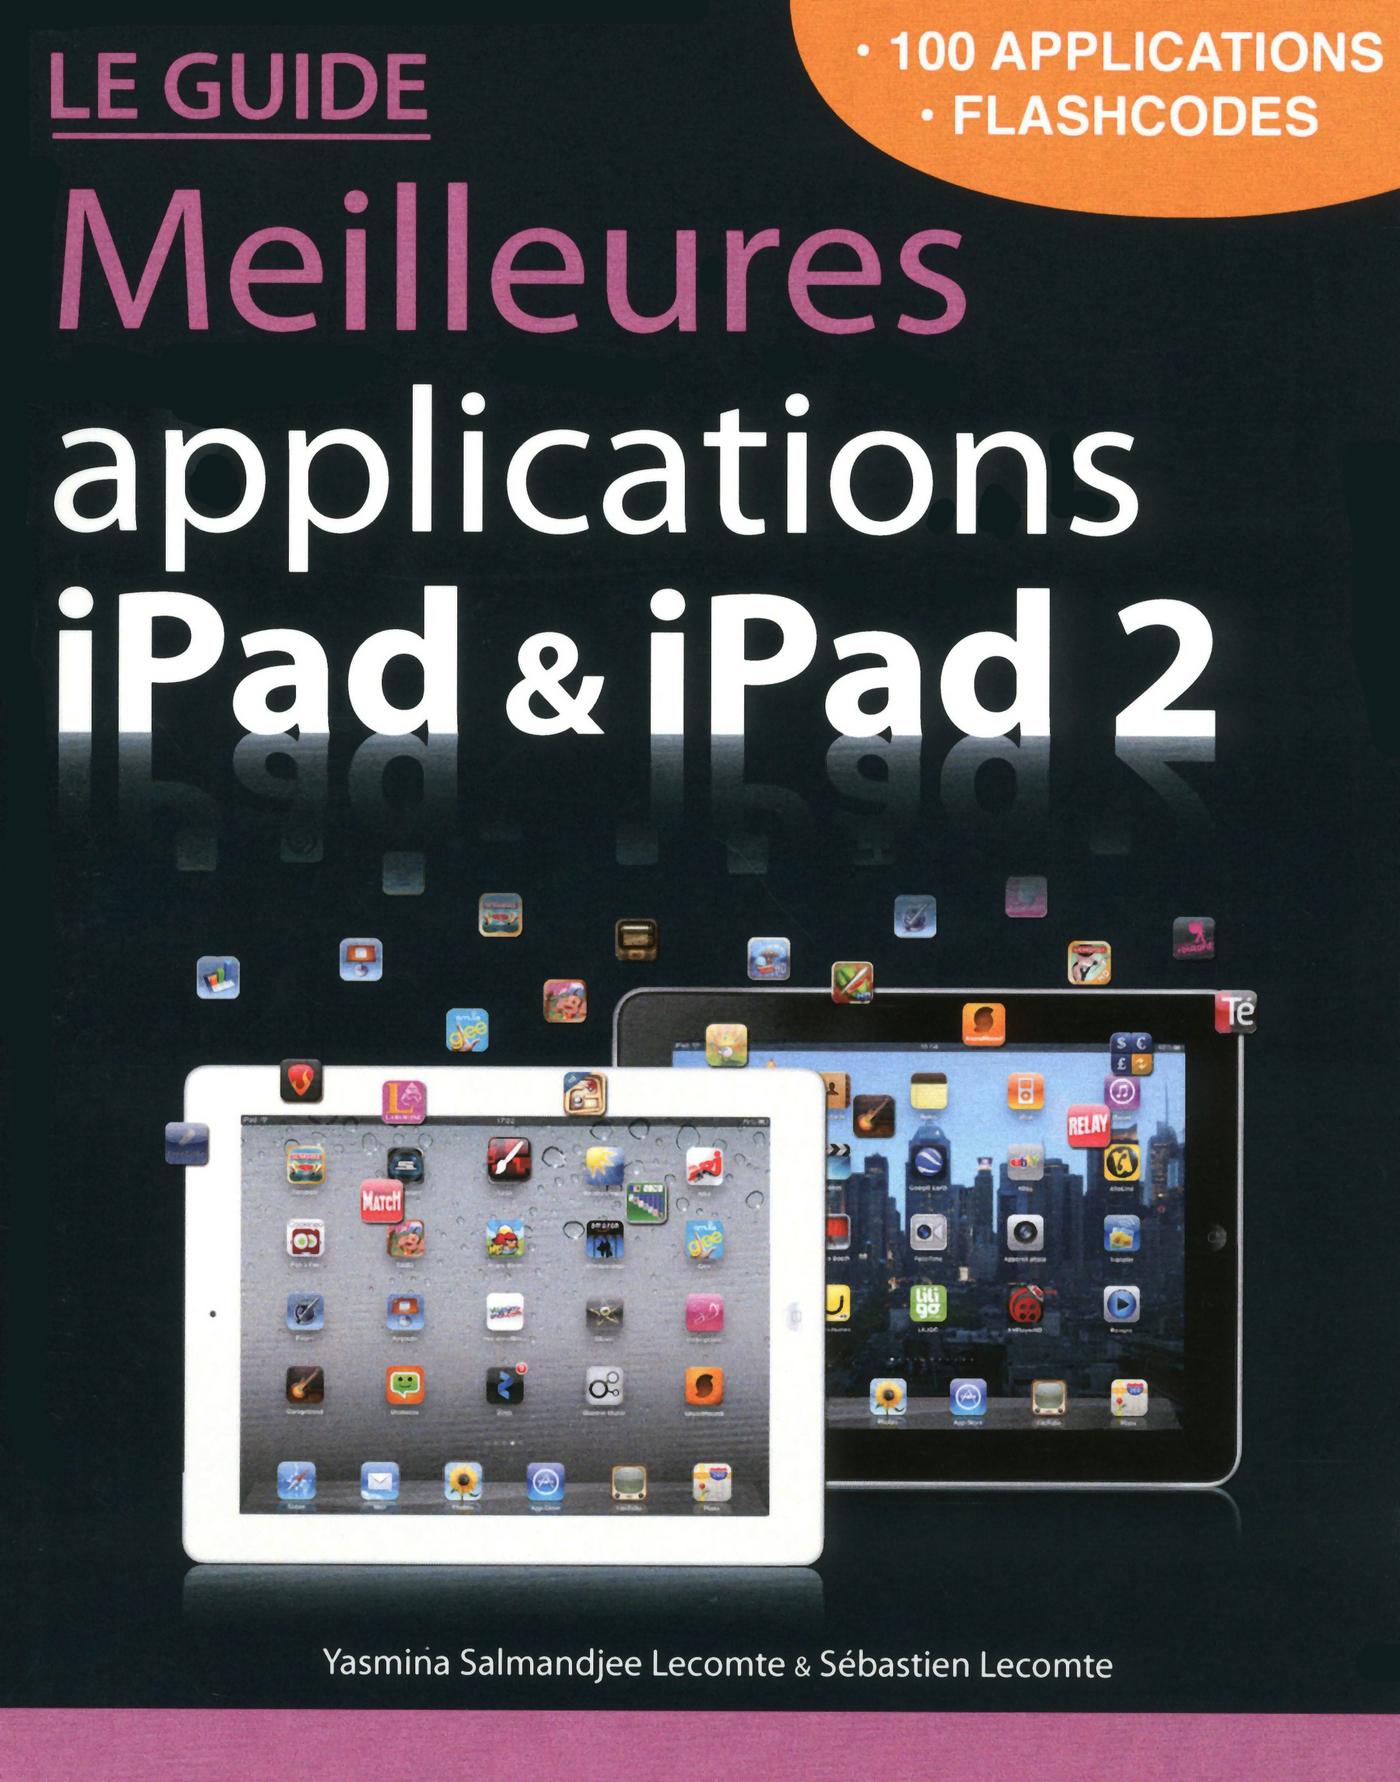 Guide des Meilleures applications iPad et iPad 2